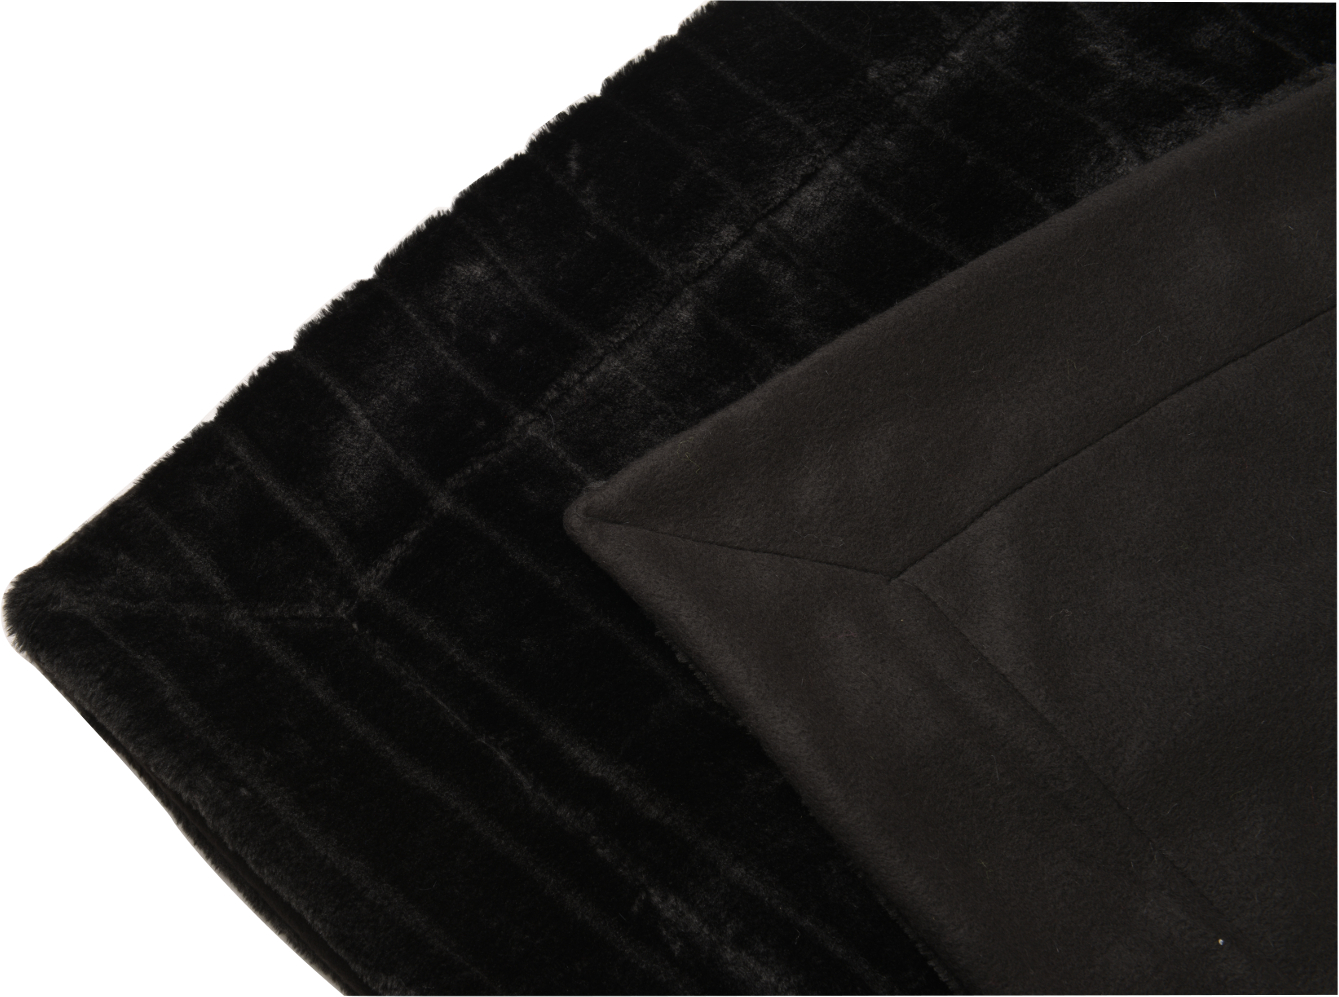 xl decke kuscheldecke 200 x 200 cm tagesdecke felloptik wohndecke sofadecke ebay. Black Bedroom Furniture Sets. Home Design Ideas